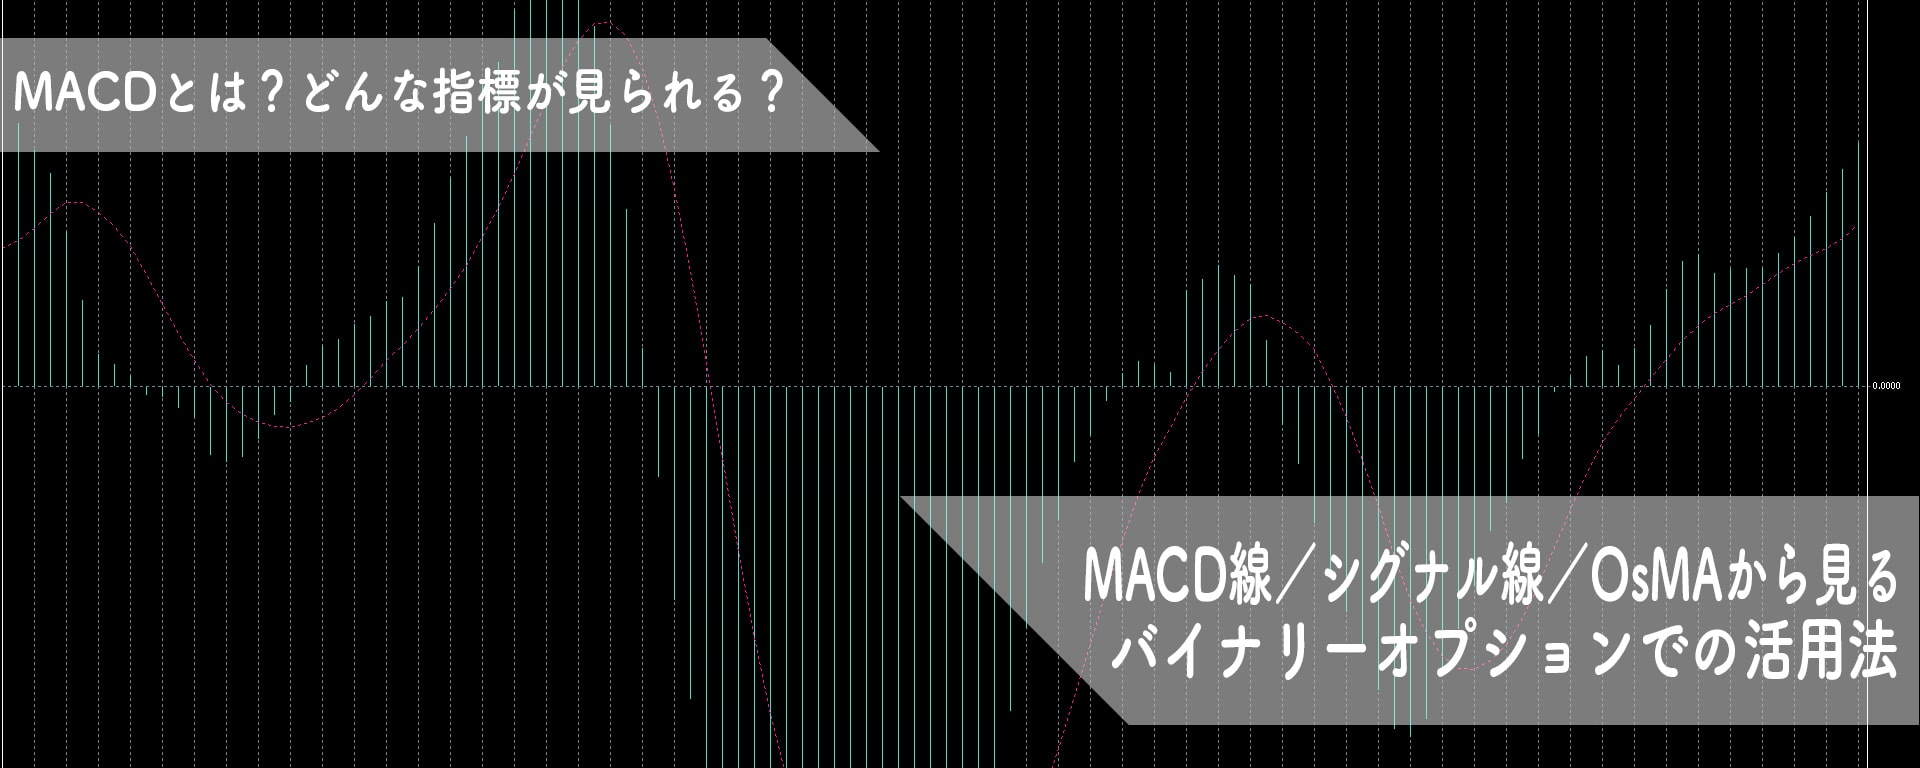 MACDはどんなチャート?バイナリーオプションでのエントリー活用法